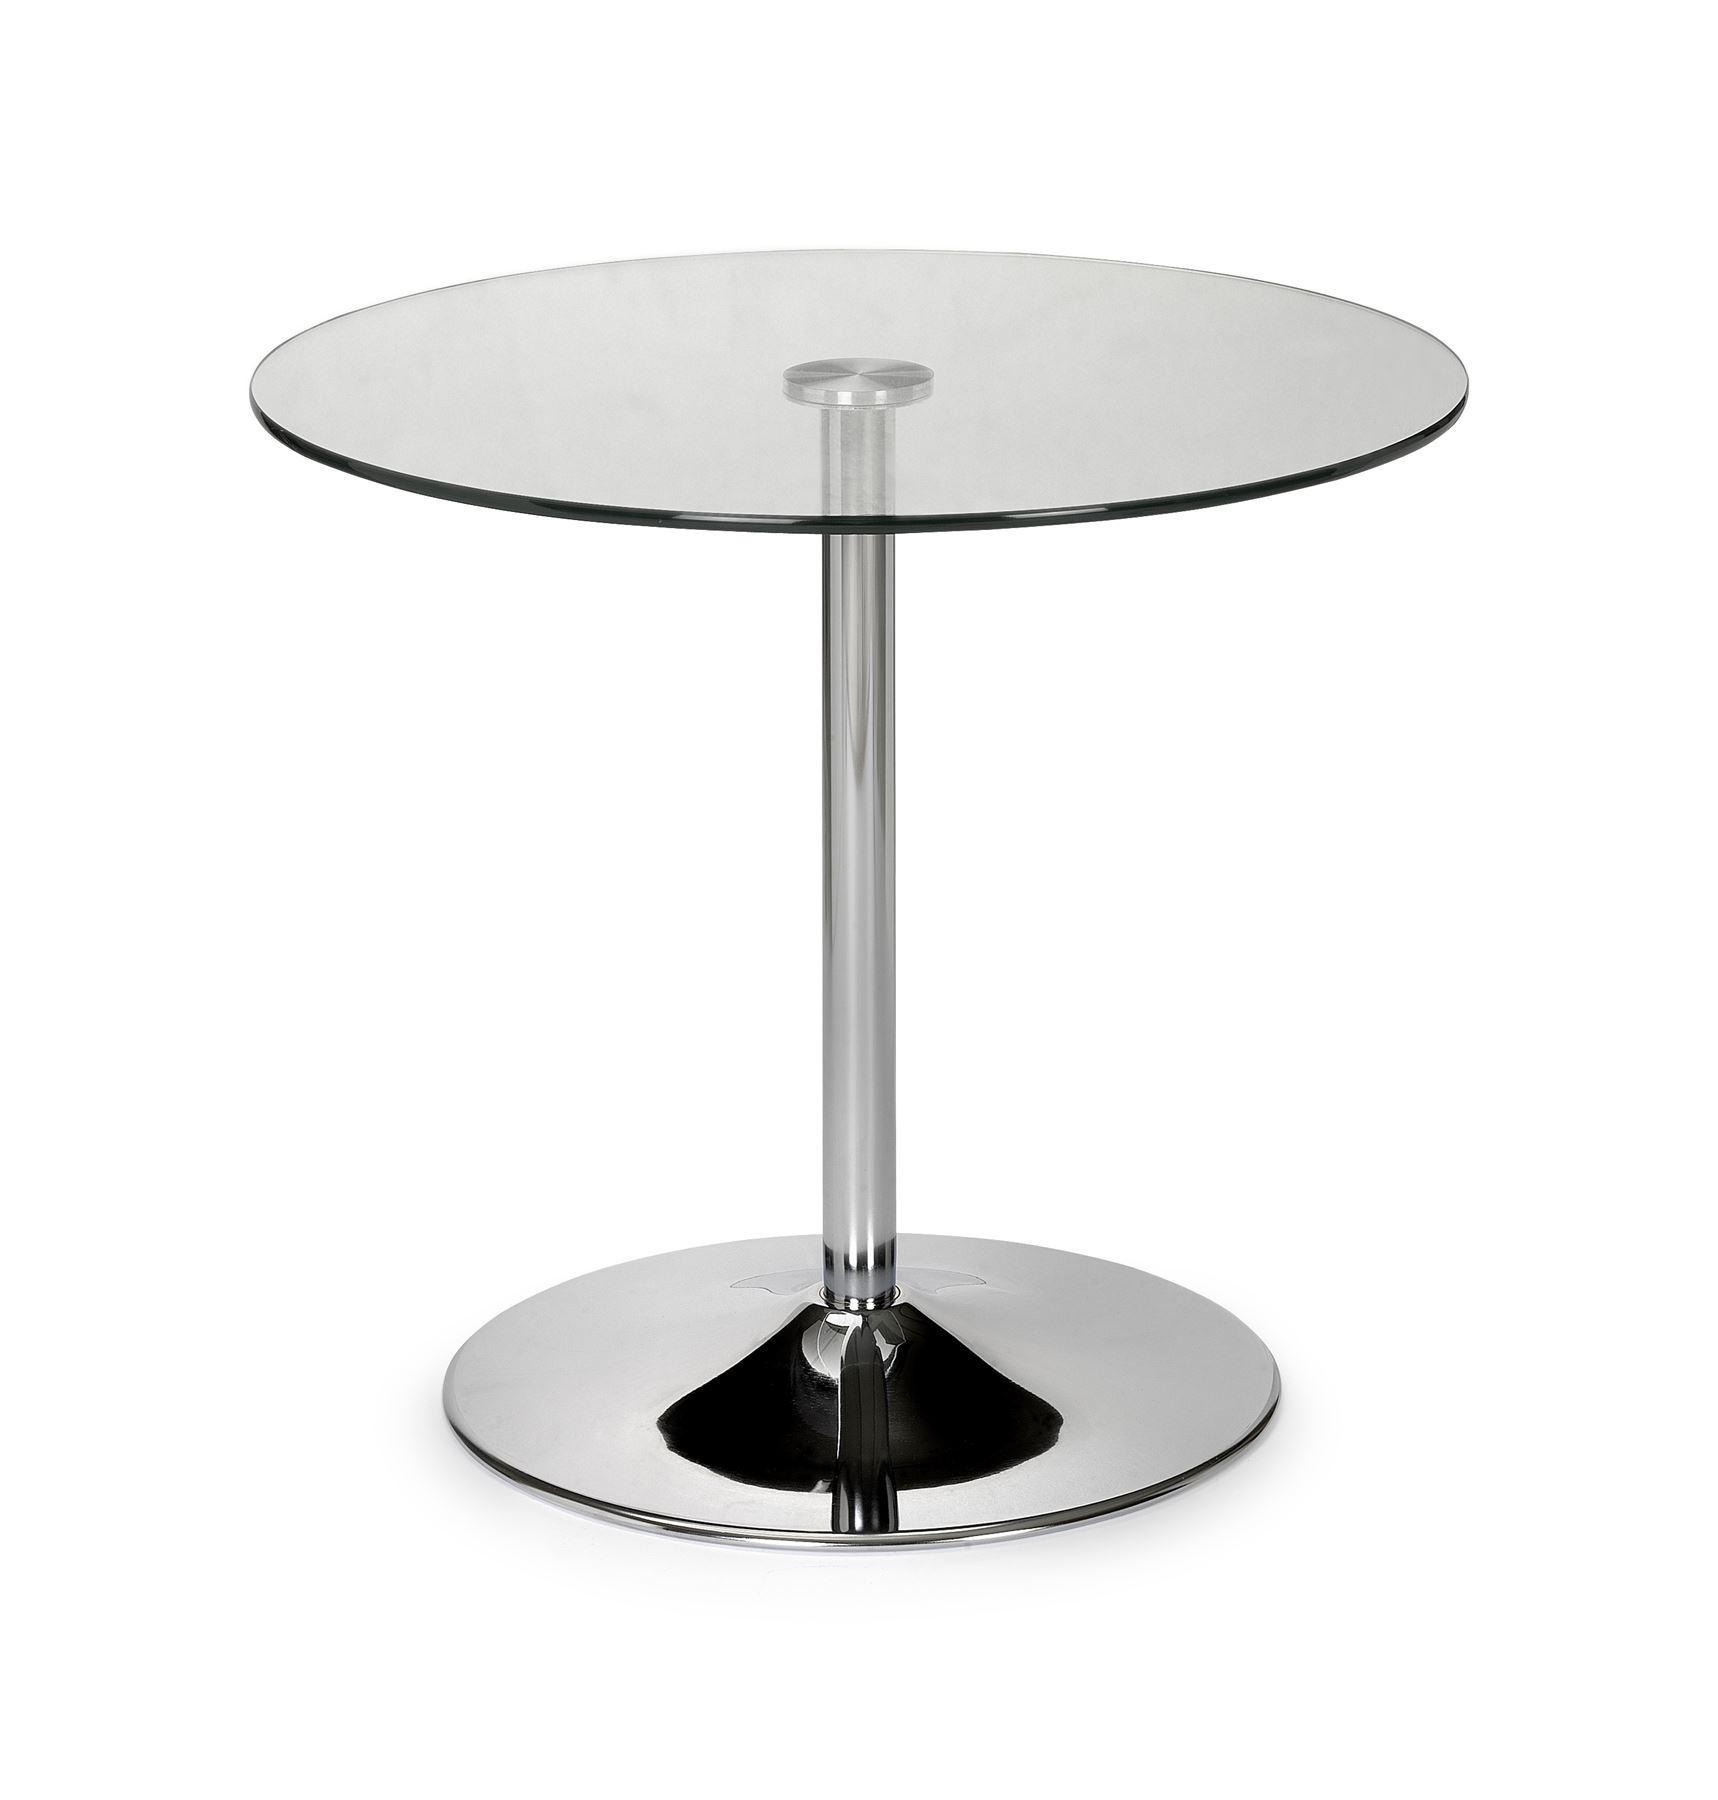 Julian Bowen Kudos Round Pedestal Small Dining Table 80cm Glass Chrome Base Www Robinsons Furniture